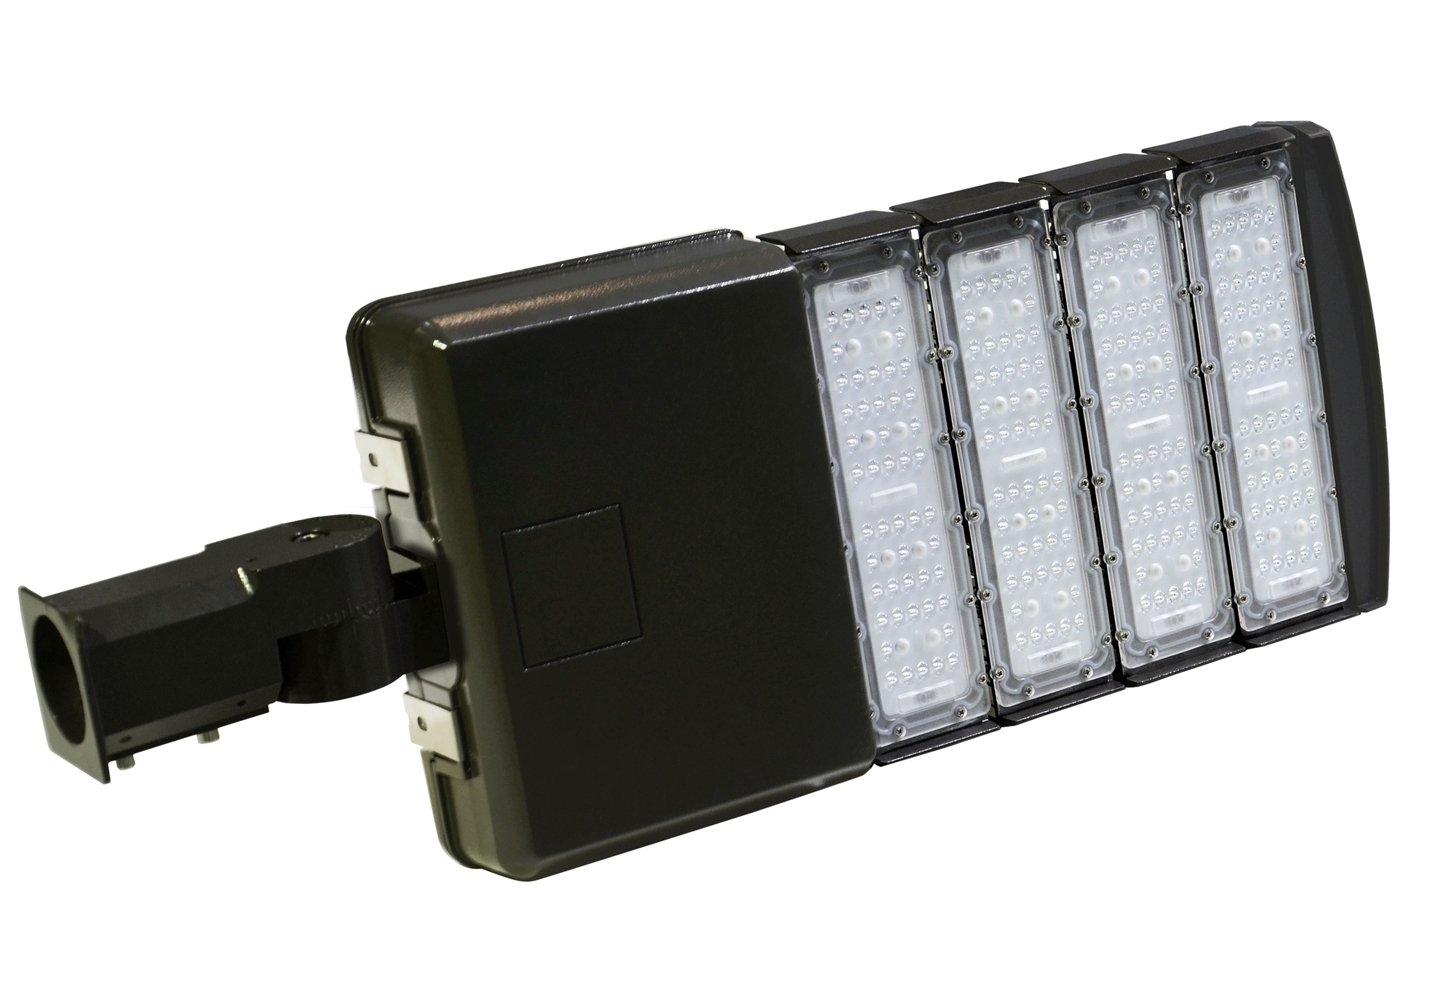 Yao-Lite 200watt LED Parking Lot Lighting for Light Poles Street Lighting Shoebox Area Light Fixtures 5000k Daylight 22000LM 5 Year Warranty